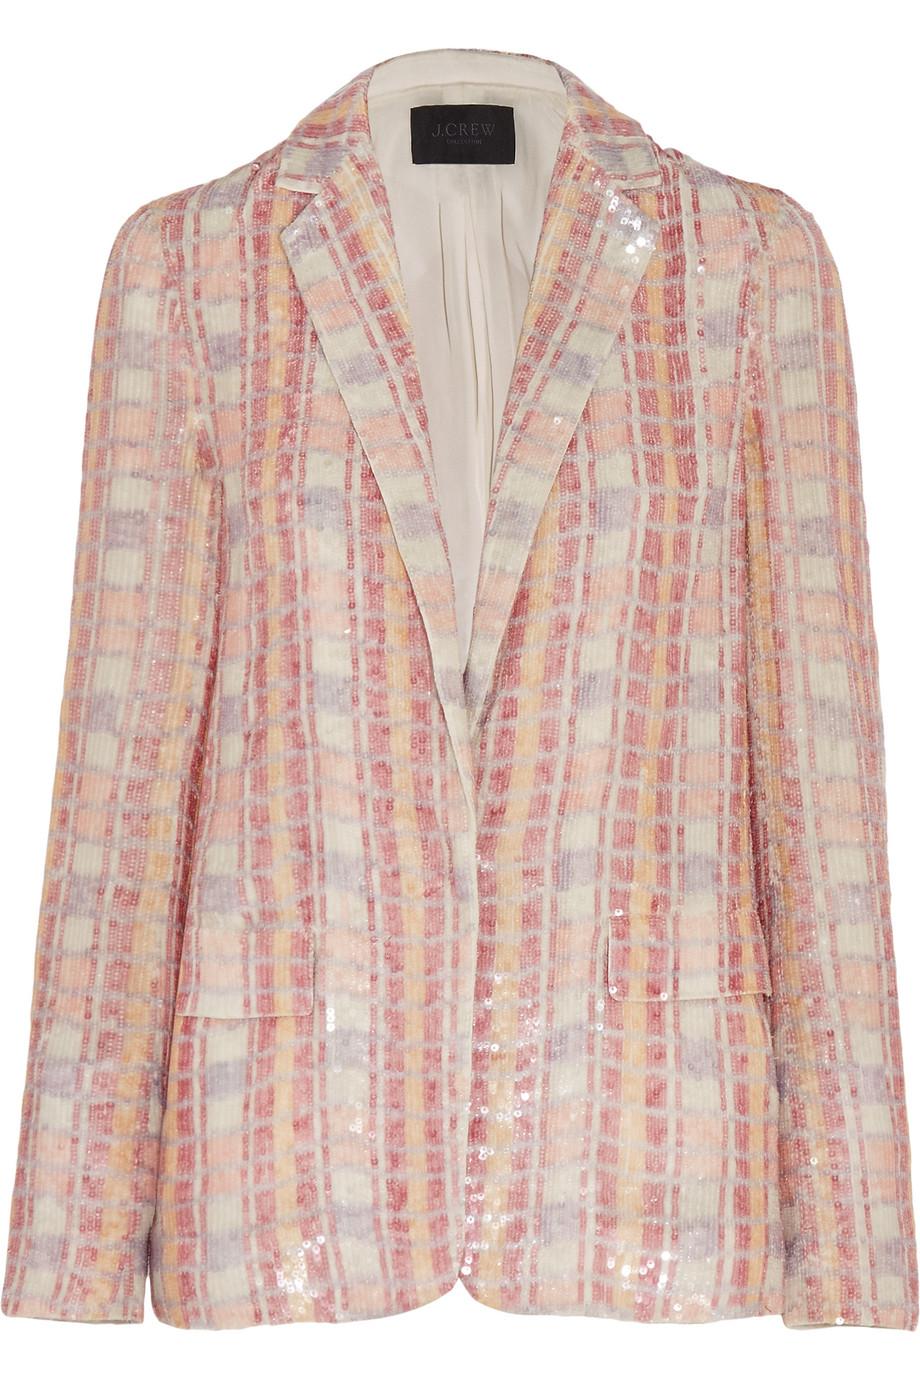 J.Crew Collection Sequined Silk-Georgette Blazer, Size: 4